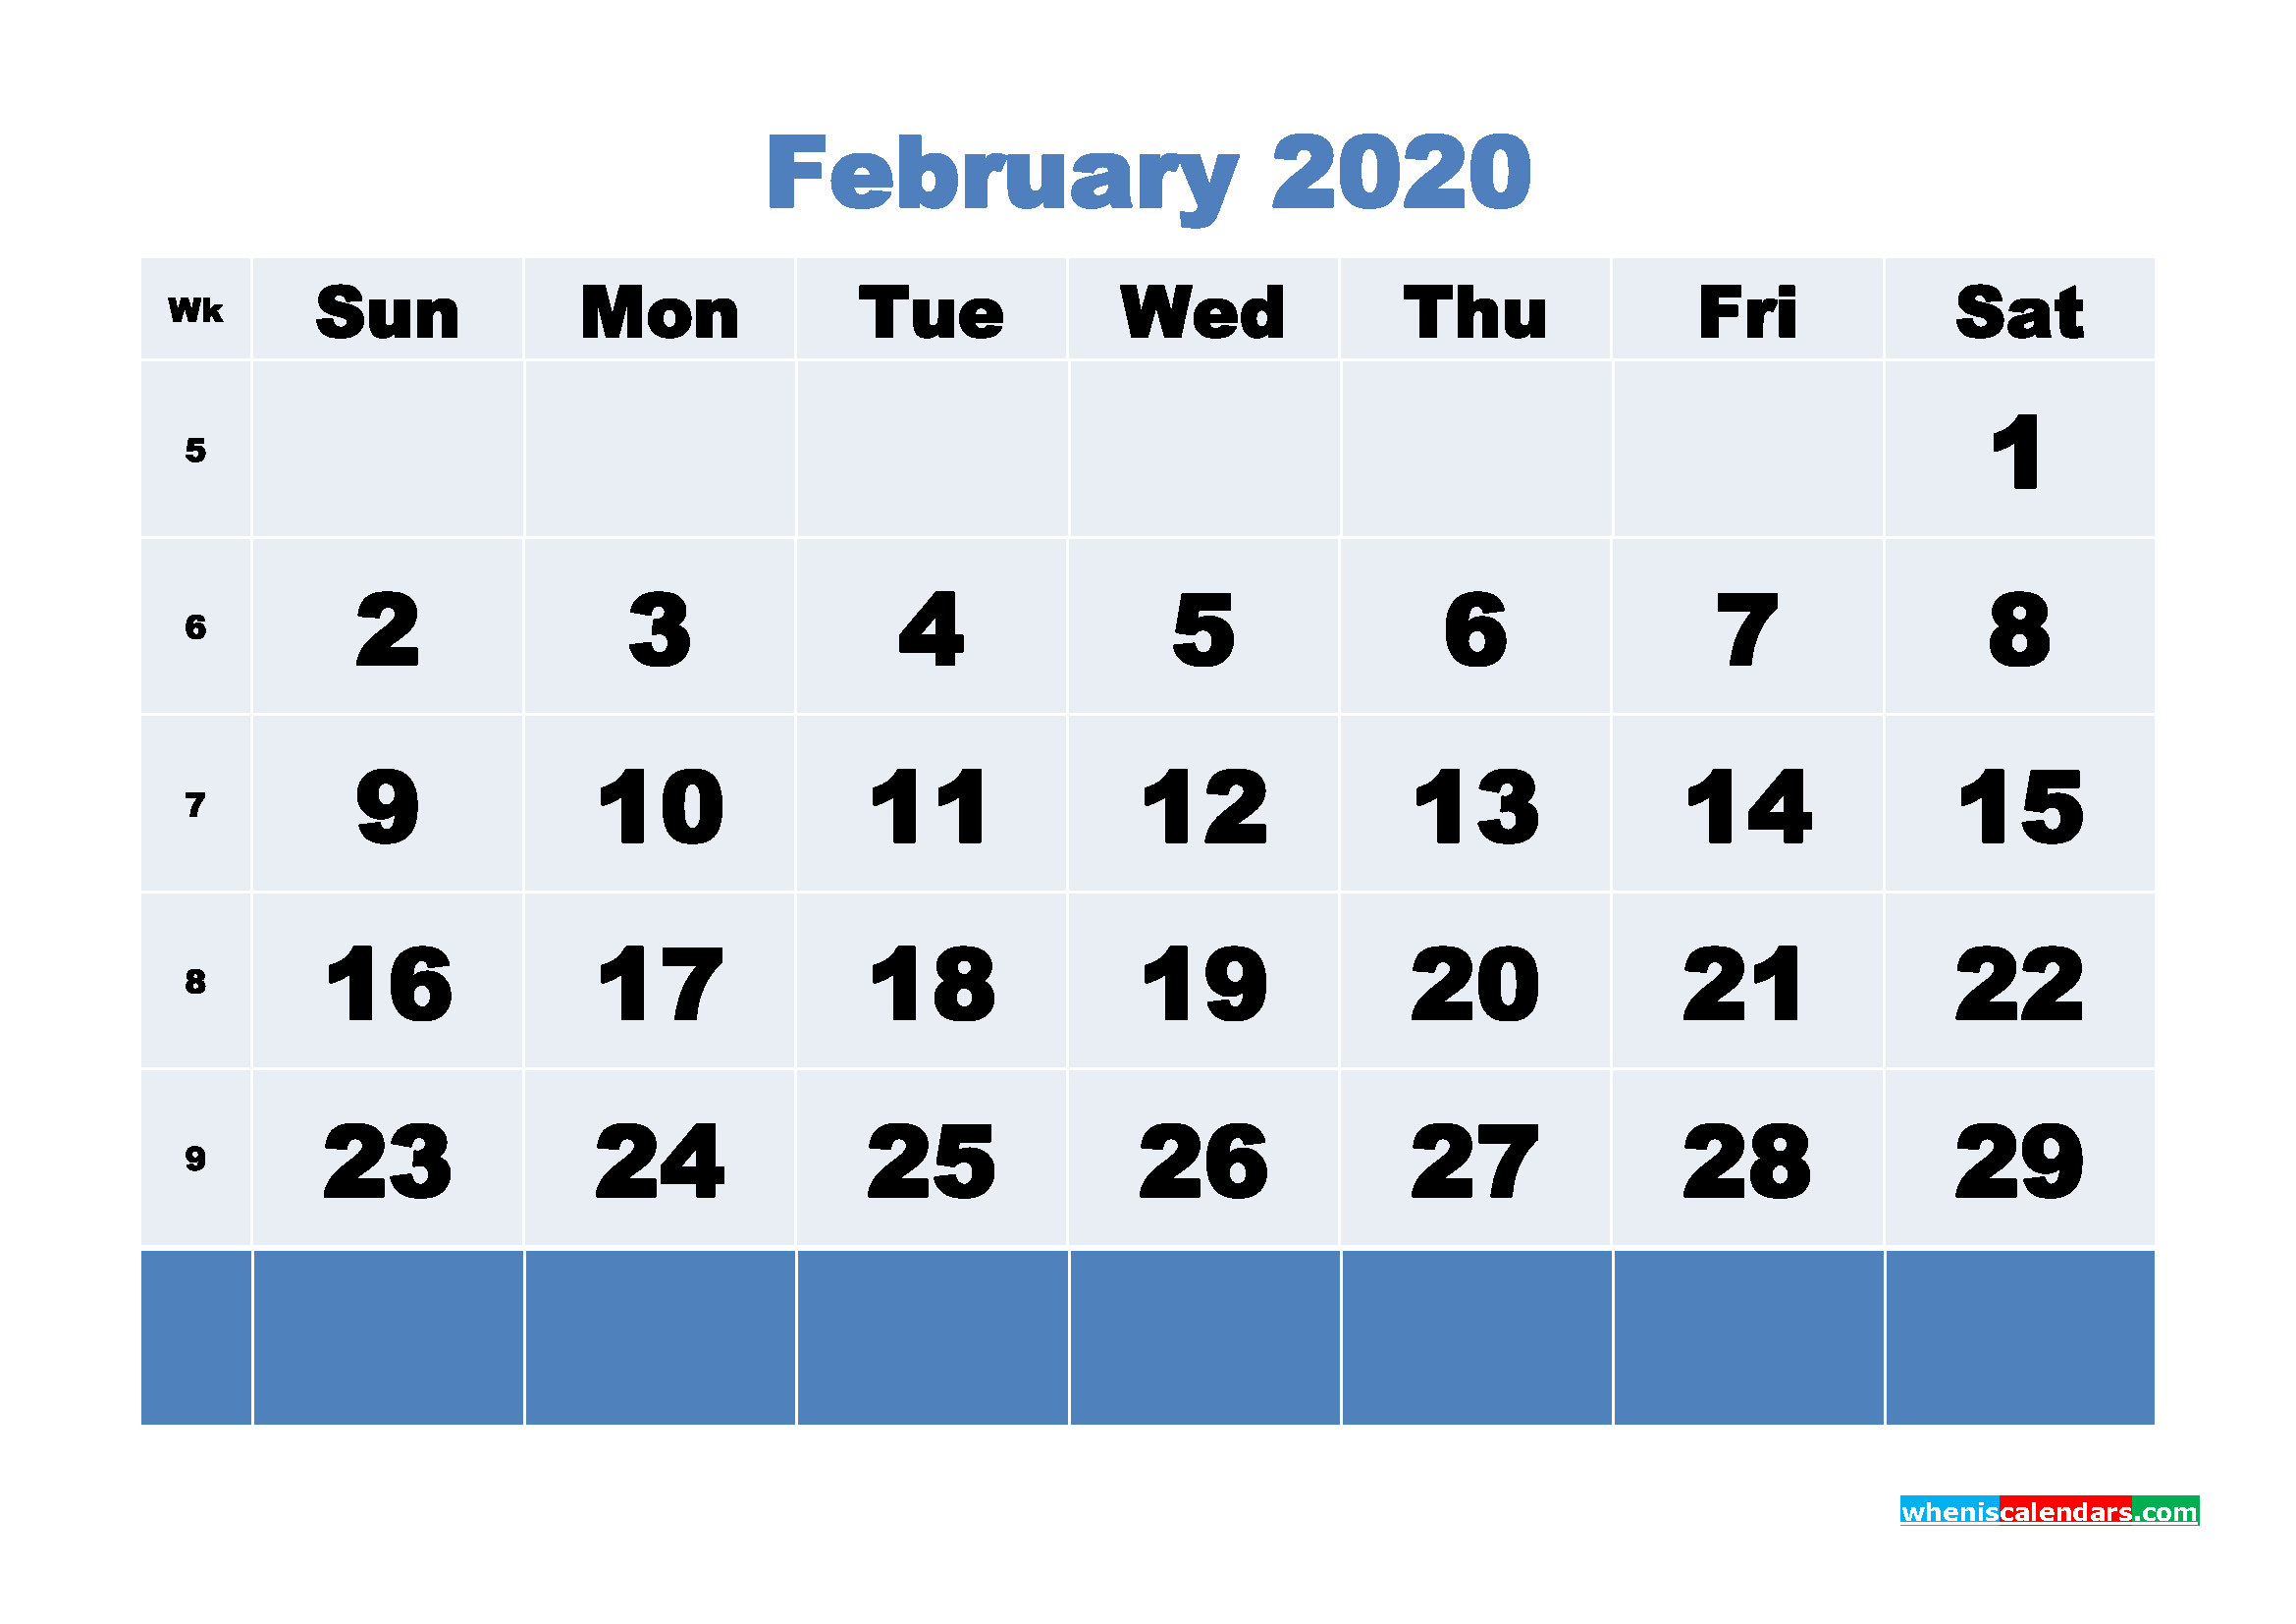 February Printable Calendar 2020 PDF, Word - No.m20b86